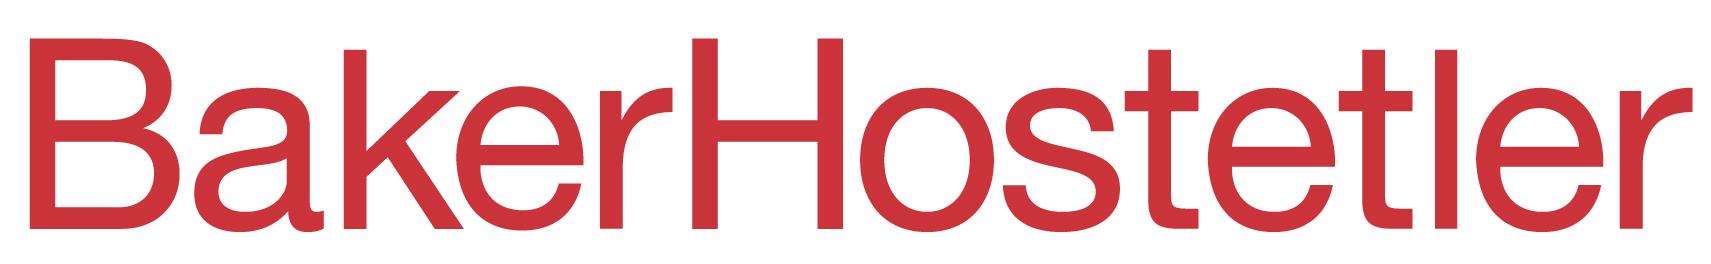 Bh logo  getz  teresa  bh11003 logo rgb 300dpi final.jpg